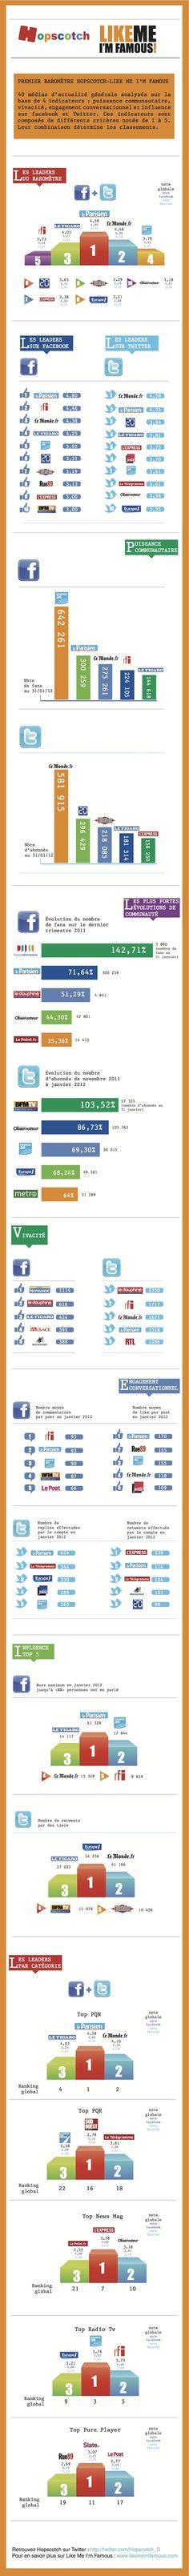 Media print & web